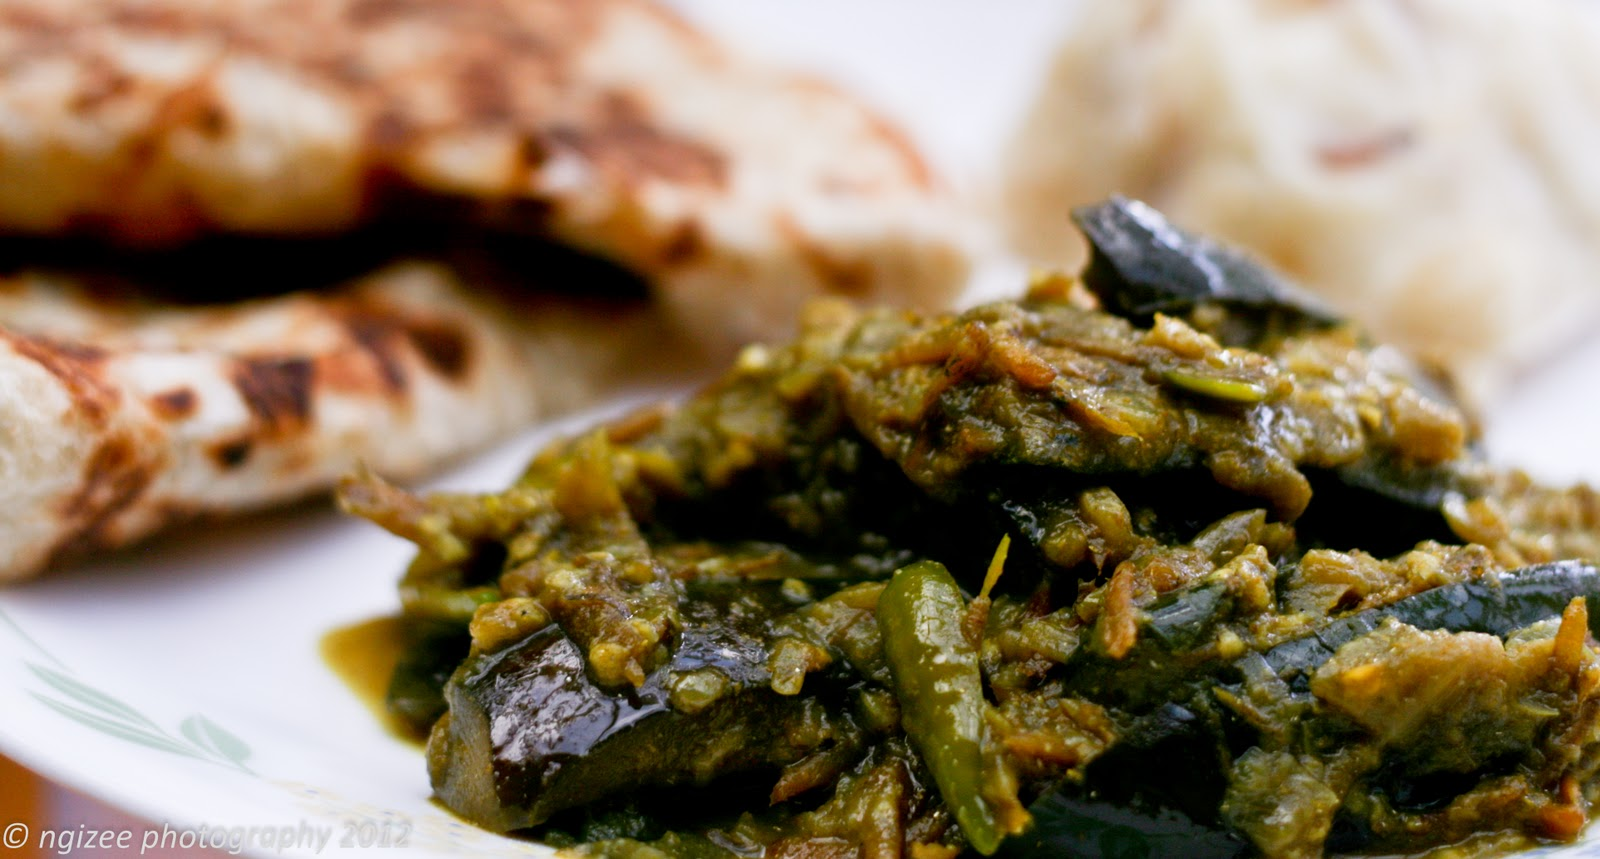 I am no food criticbut eggplant with dried fishngladeshi bangladeshi baingan shutki forumfinder Image collections